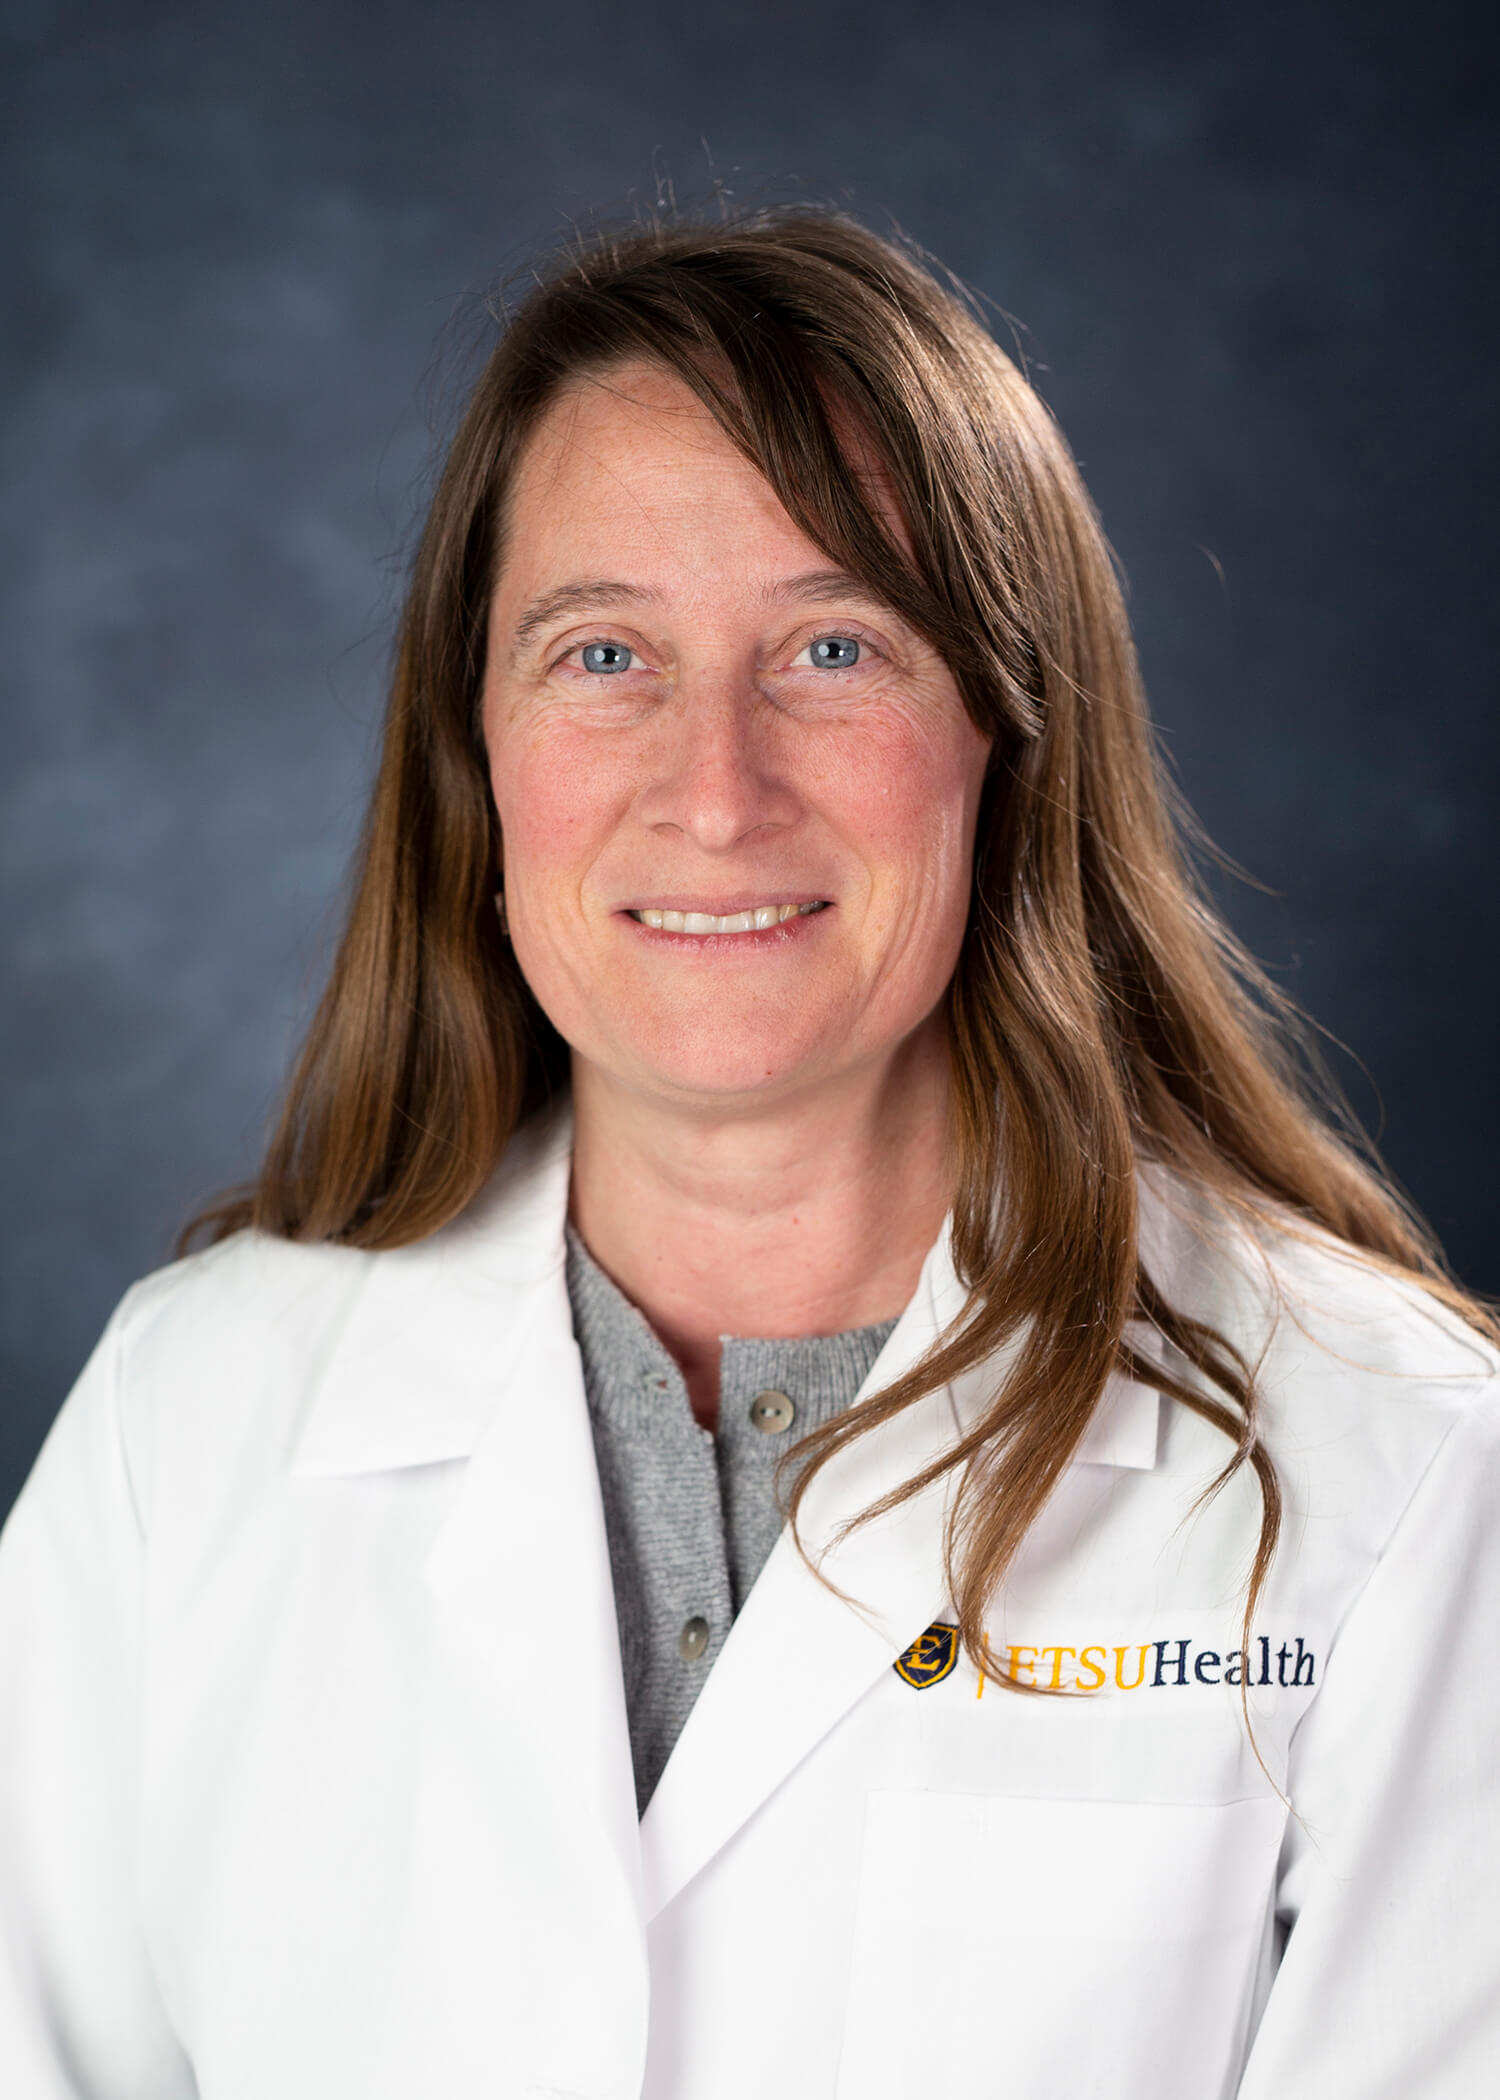 Photo of Joyce Troxler, M.D.